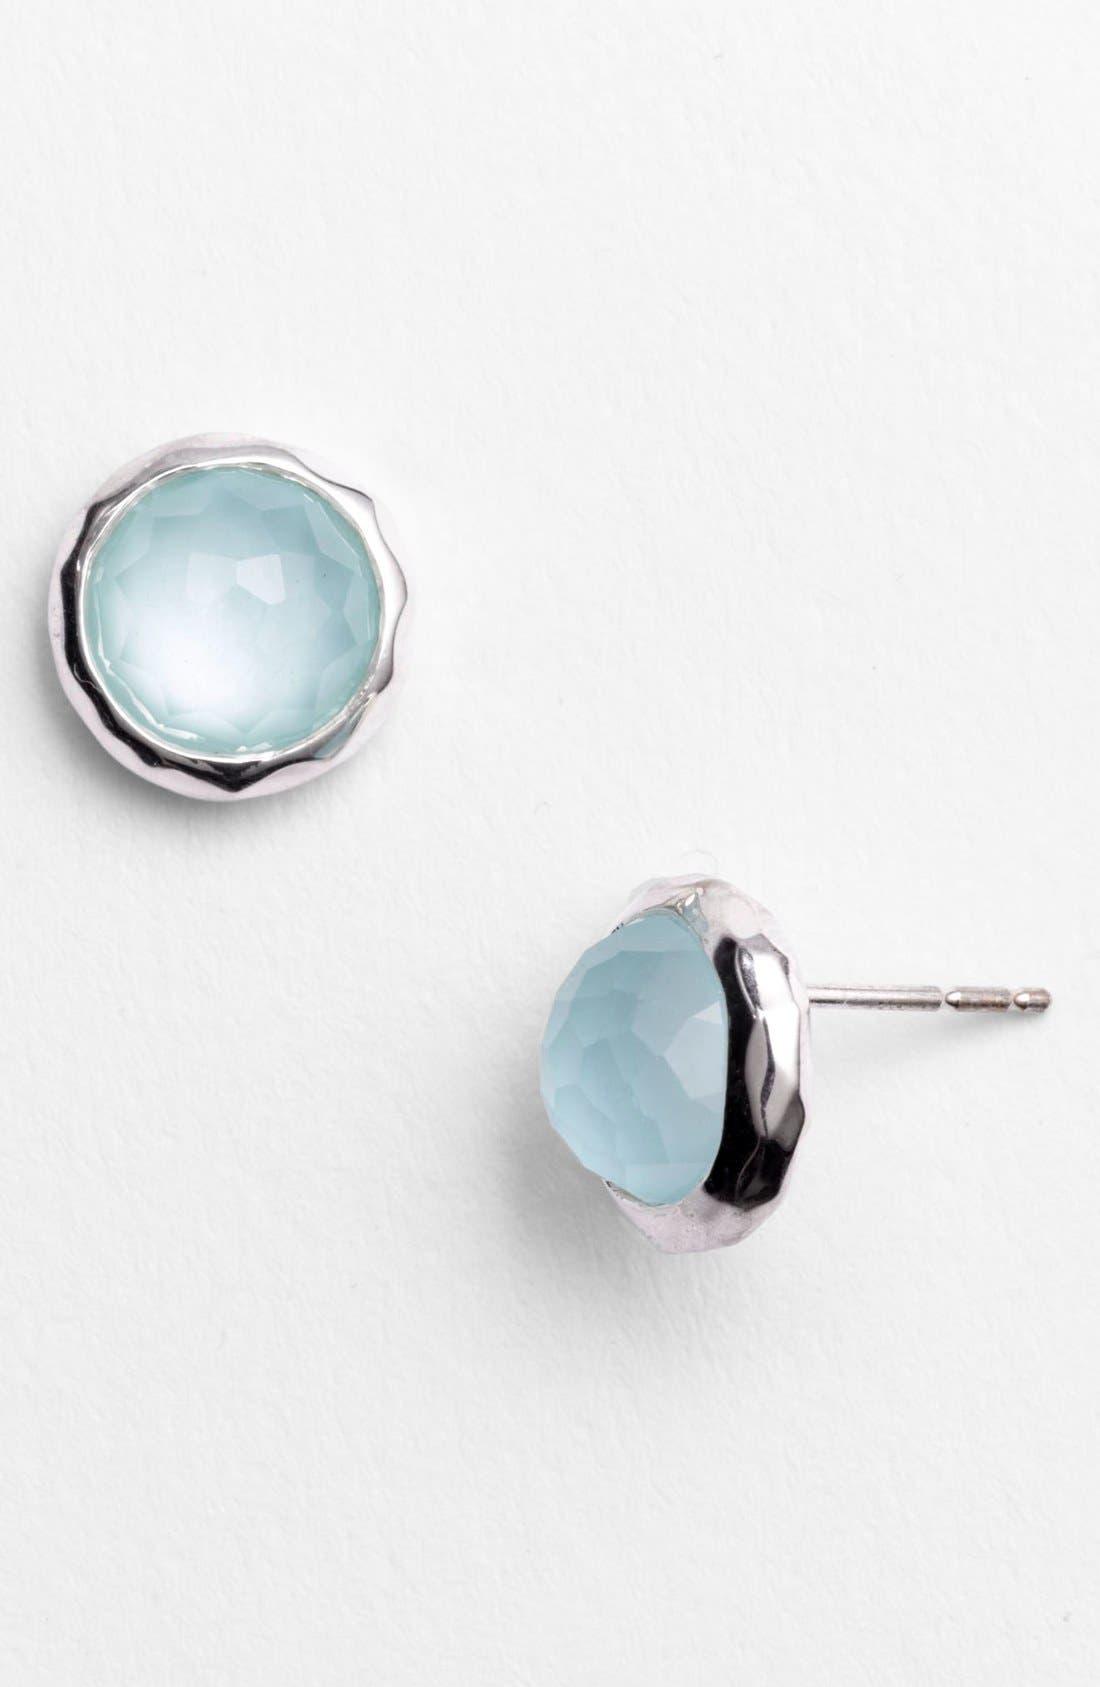 Alternate Image 1 Selected - Ippolita 'Rock Candy' Semiprecious Stud Earrings